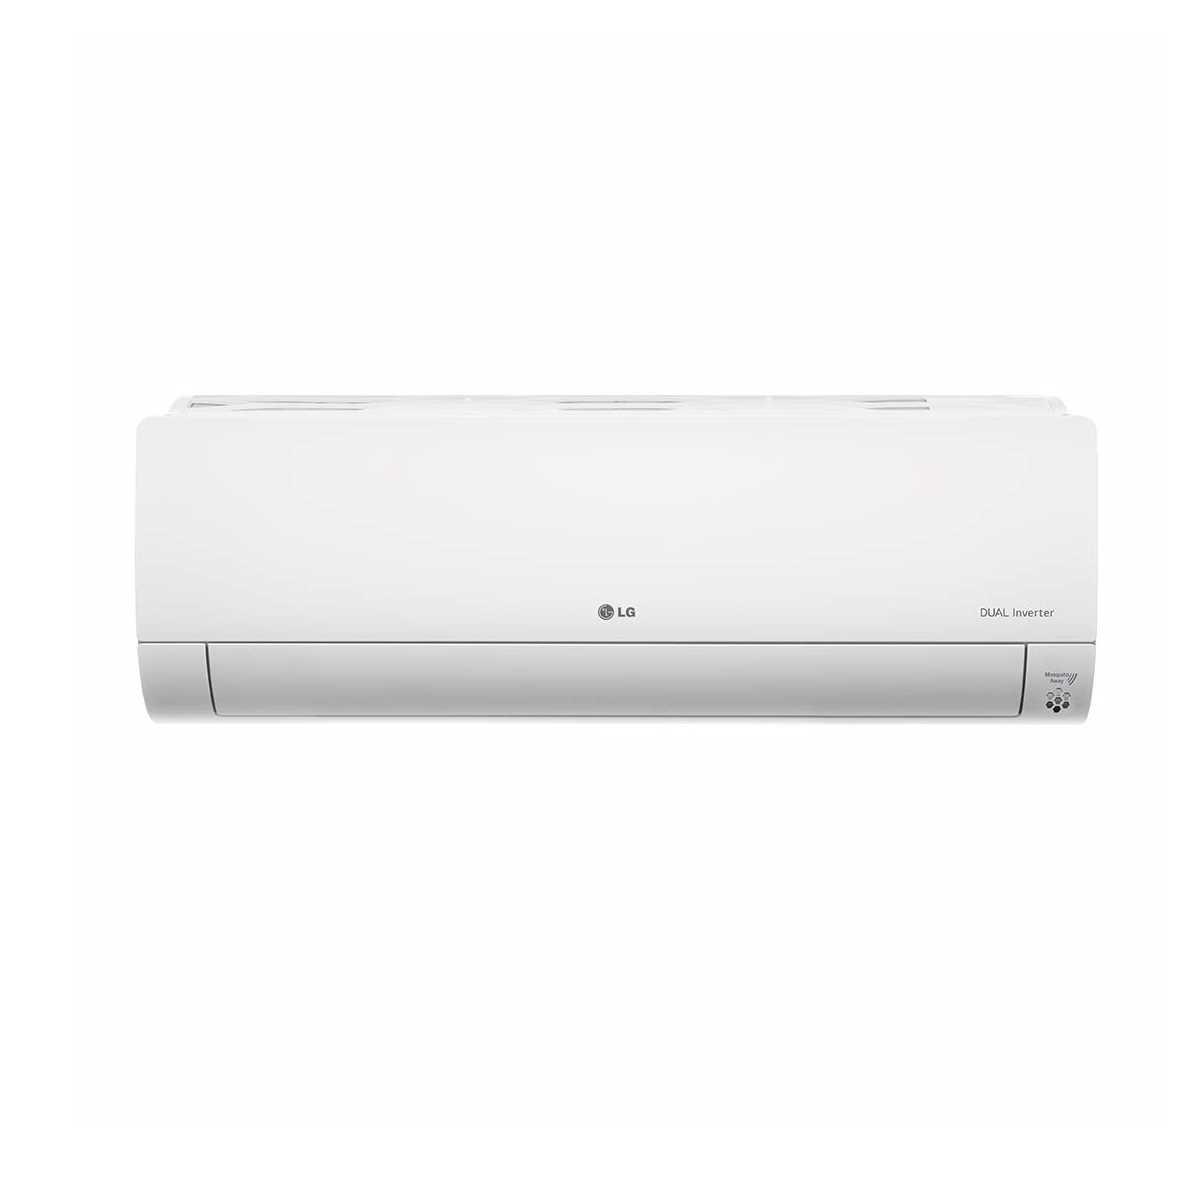 LG KS Q18HTXD 1.5 Ton 3 Star Inverter Split AC